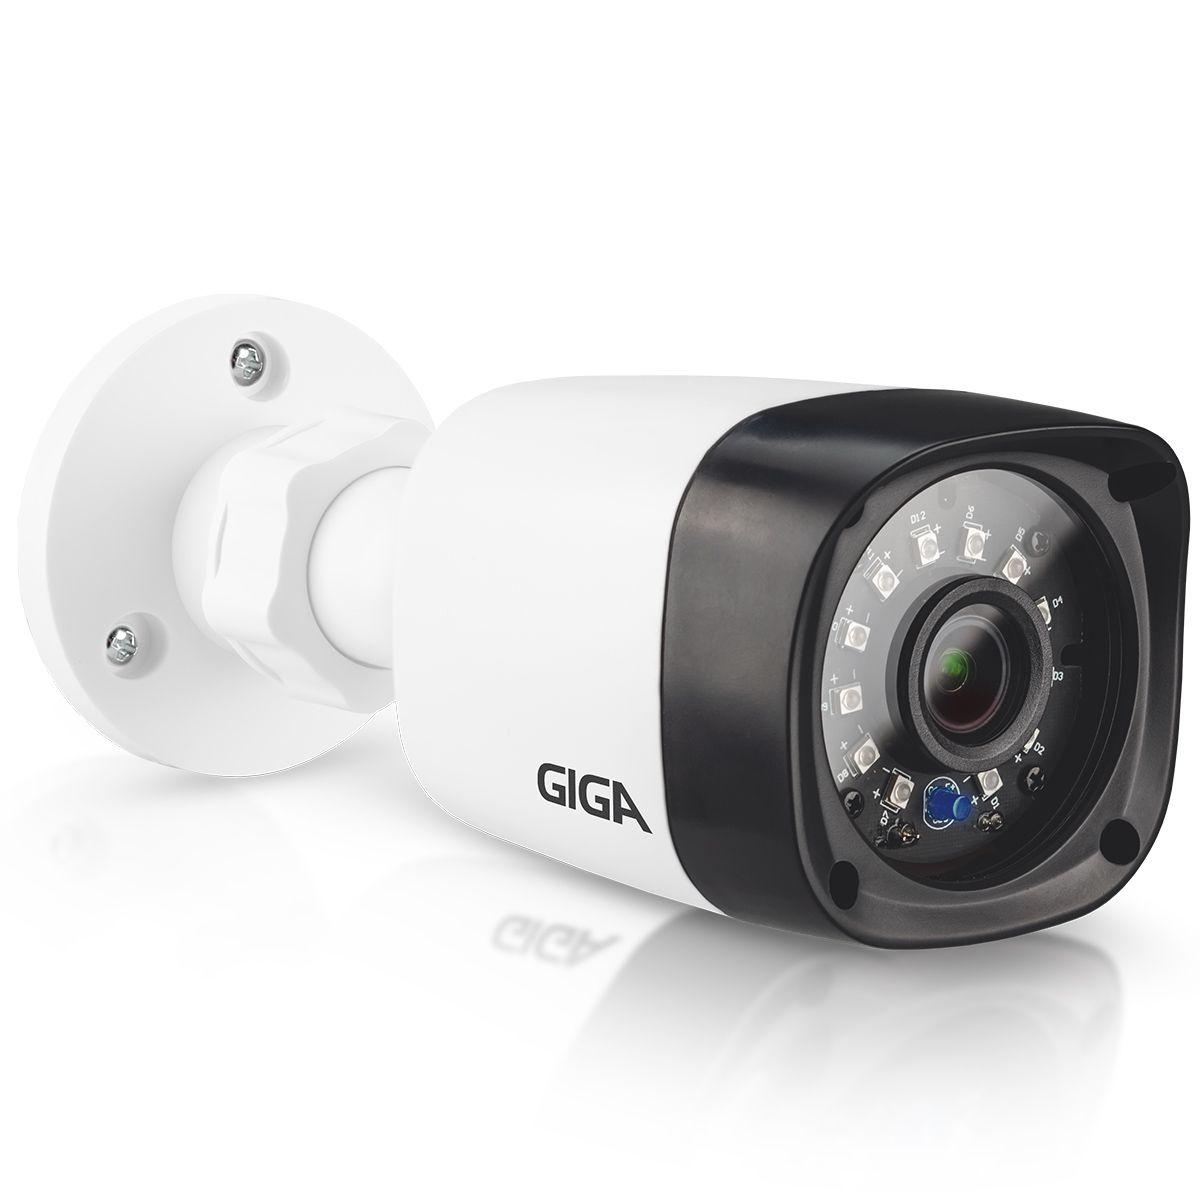 camera-hd-giga-security-gs0021-orion-1mp-30-metros